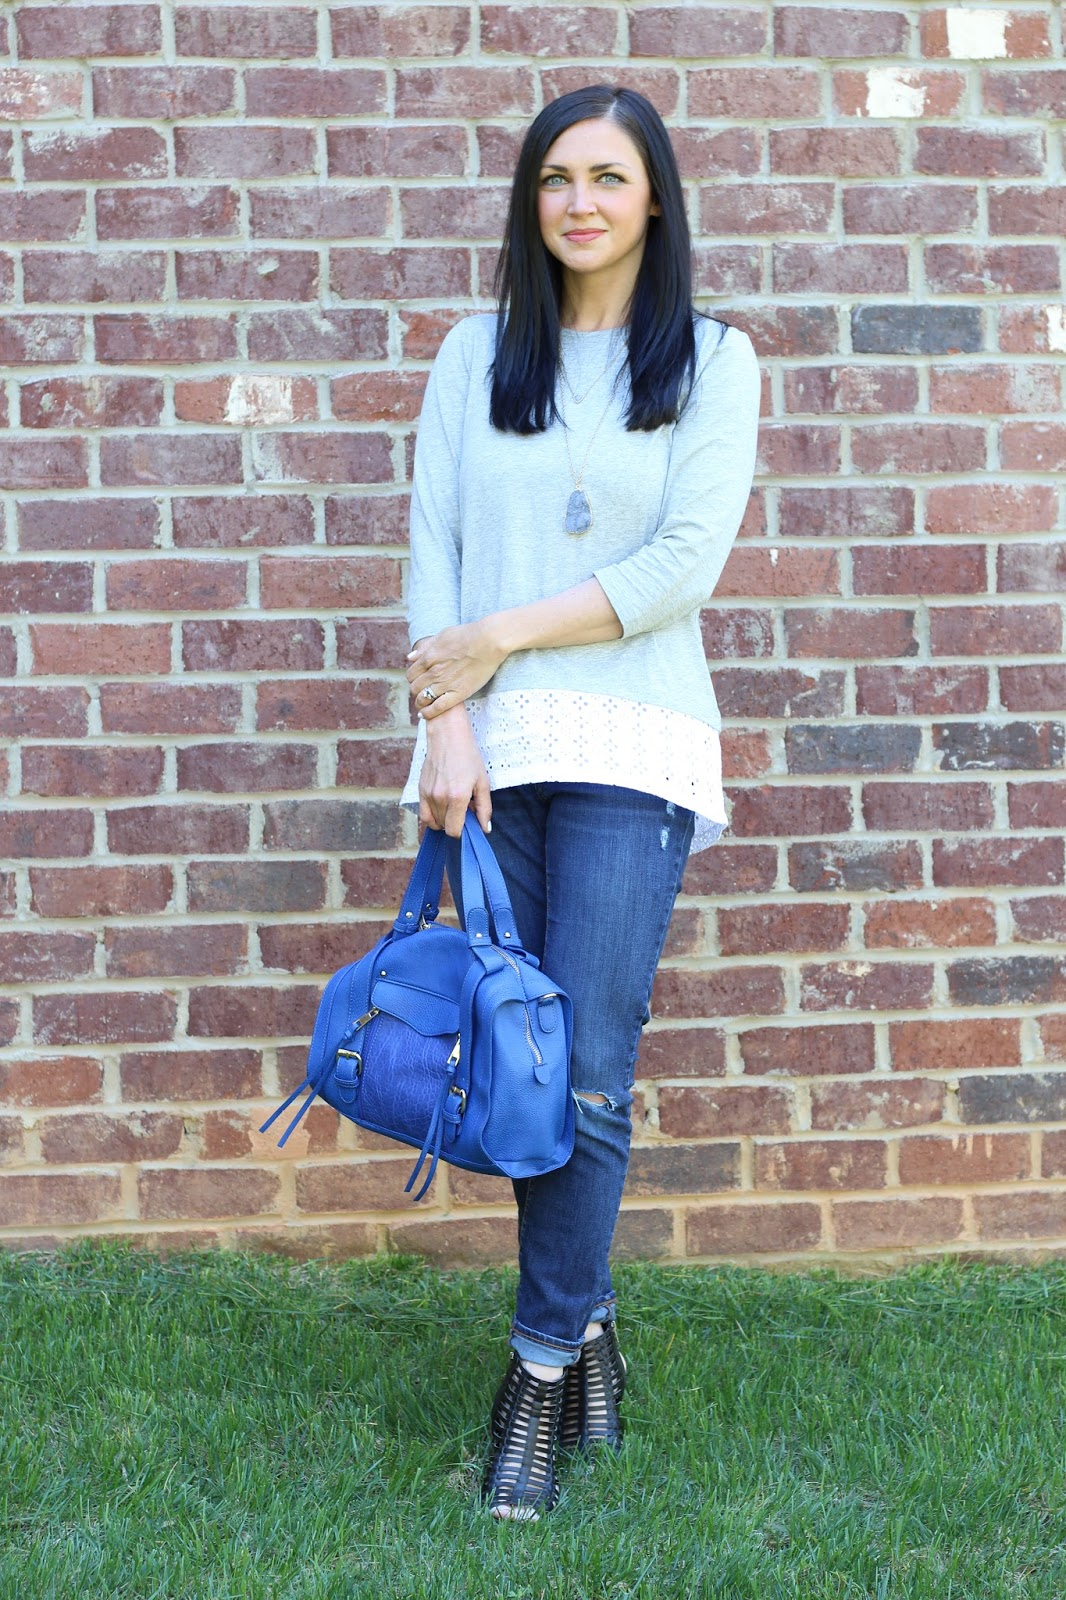 Caged sandals, eyelet, J. Jill, blue satchel